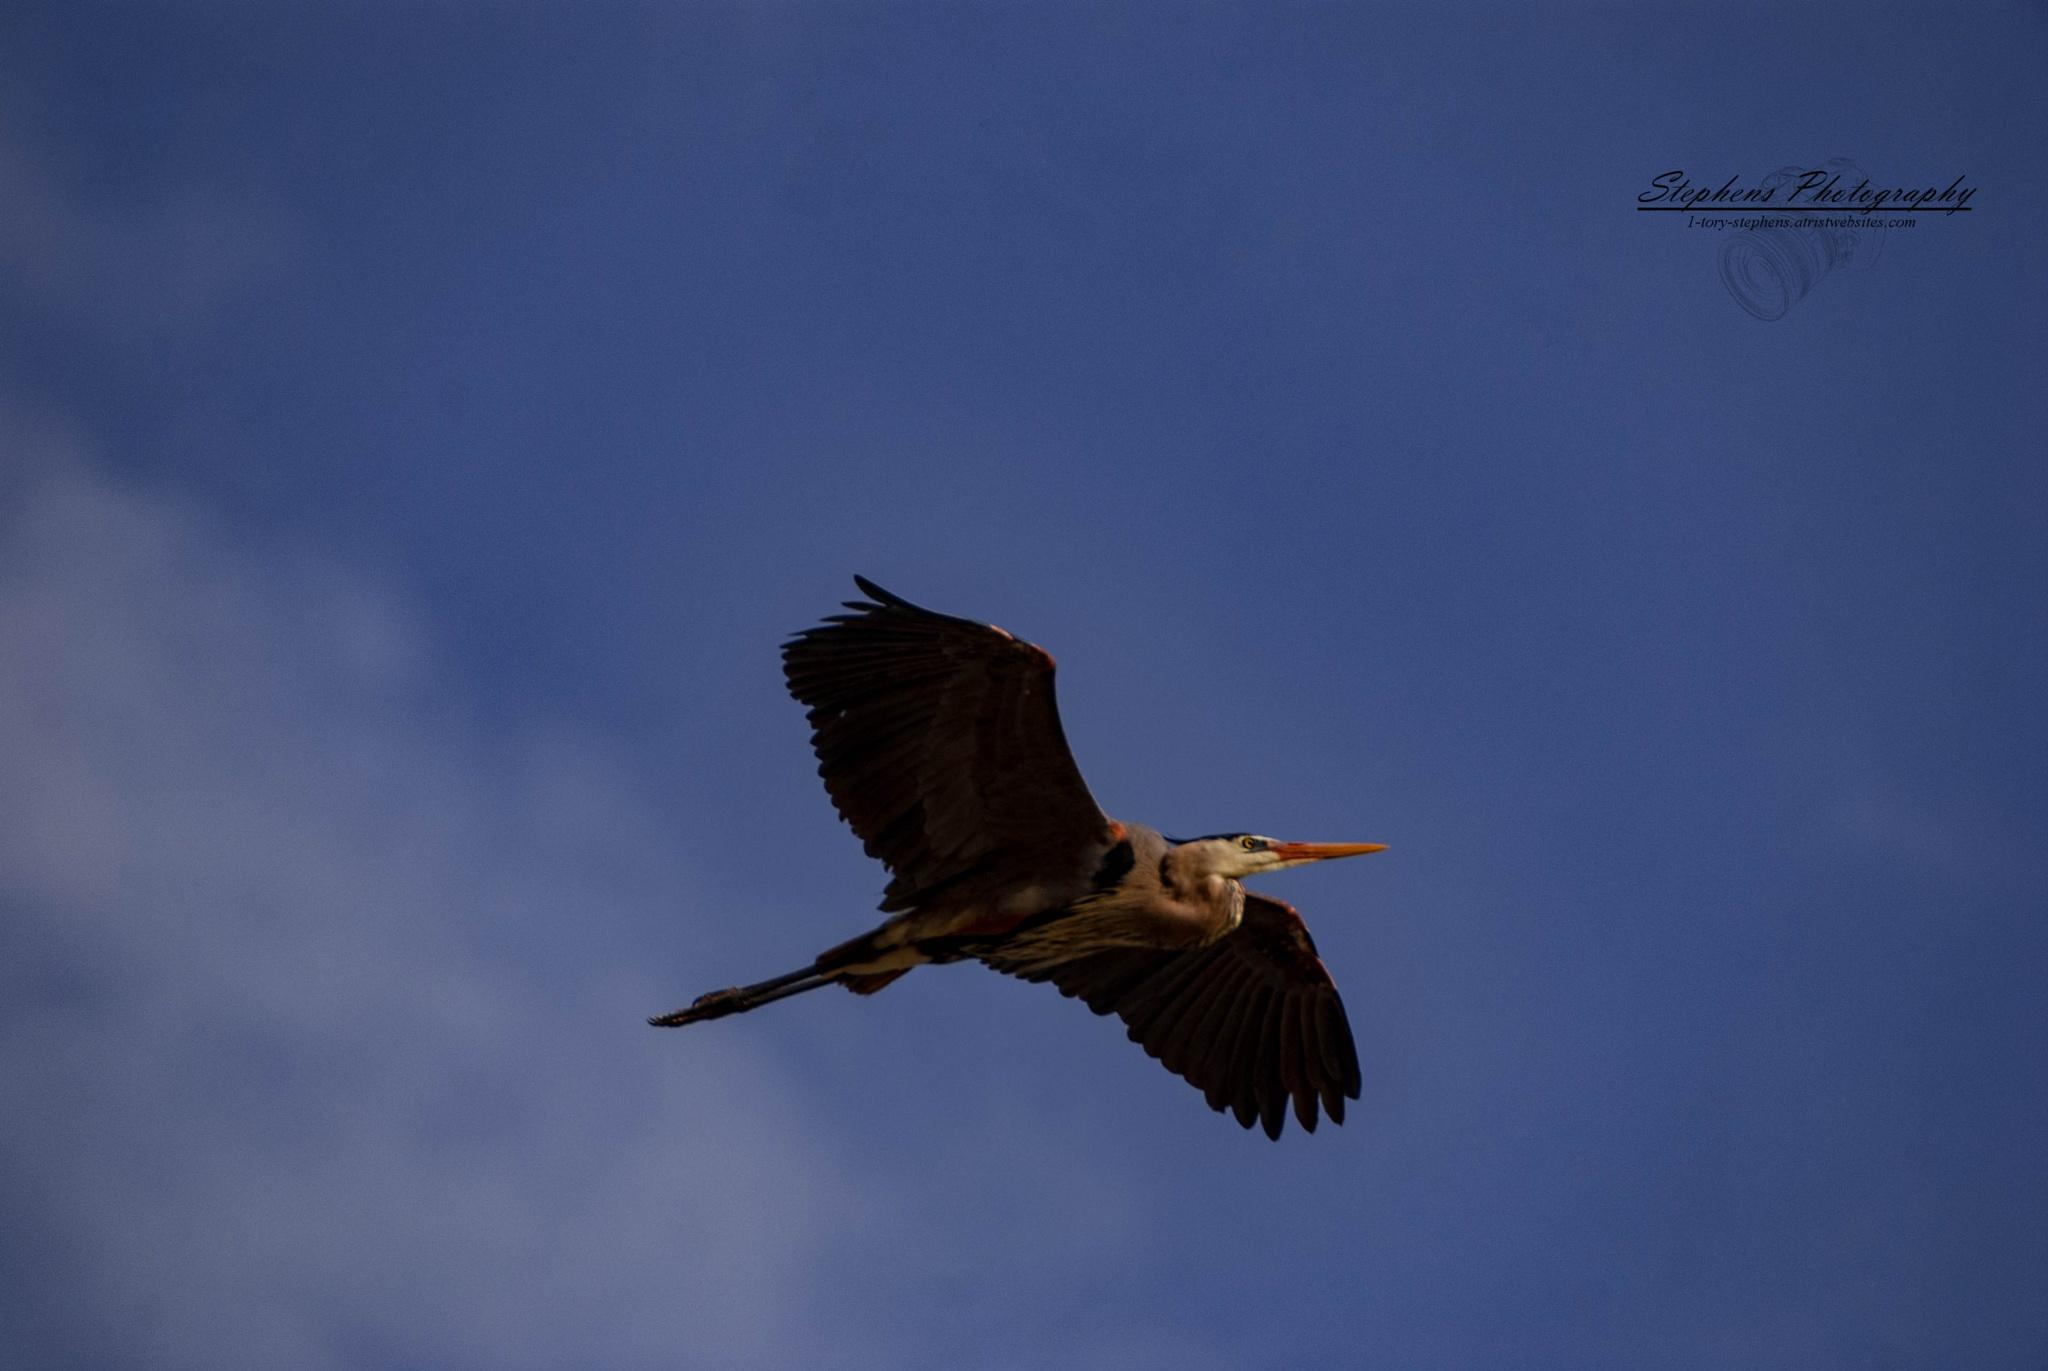 Great Blue Heron in Flight by Tory L. Stephens